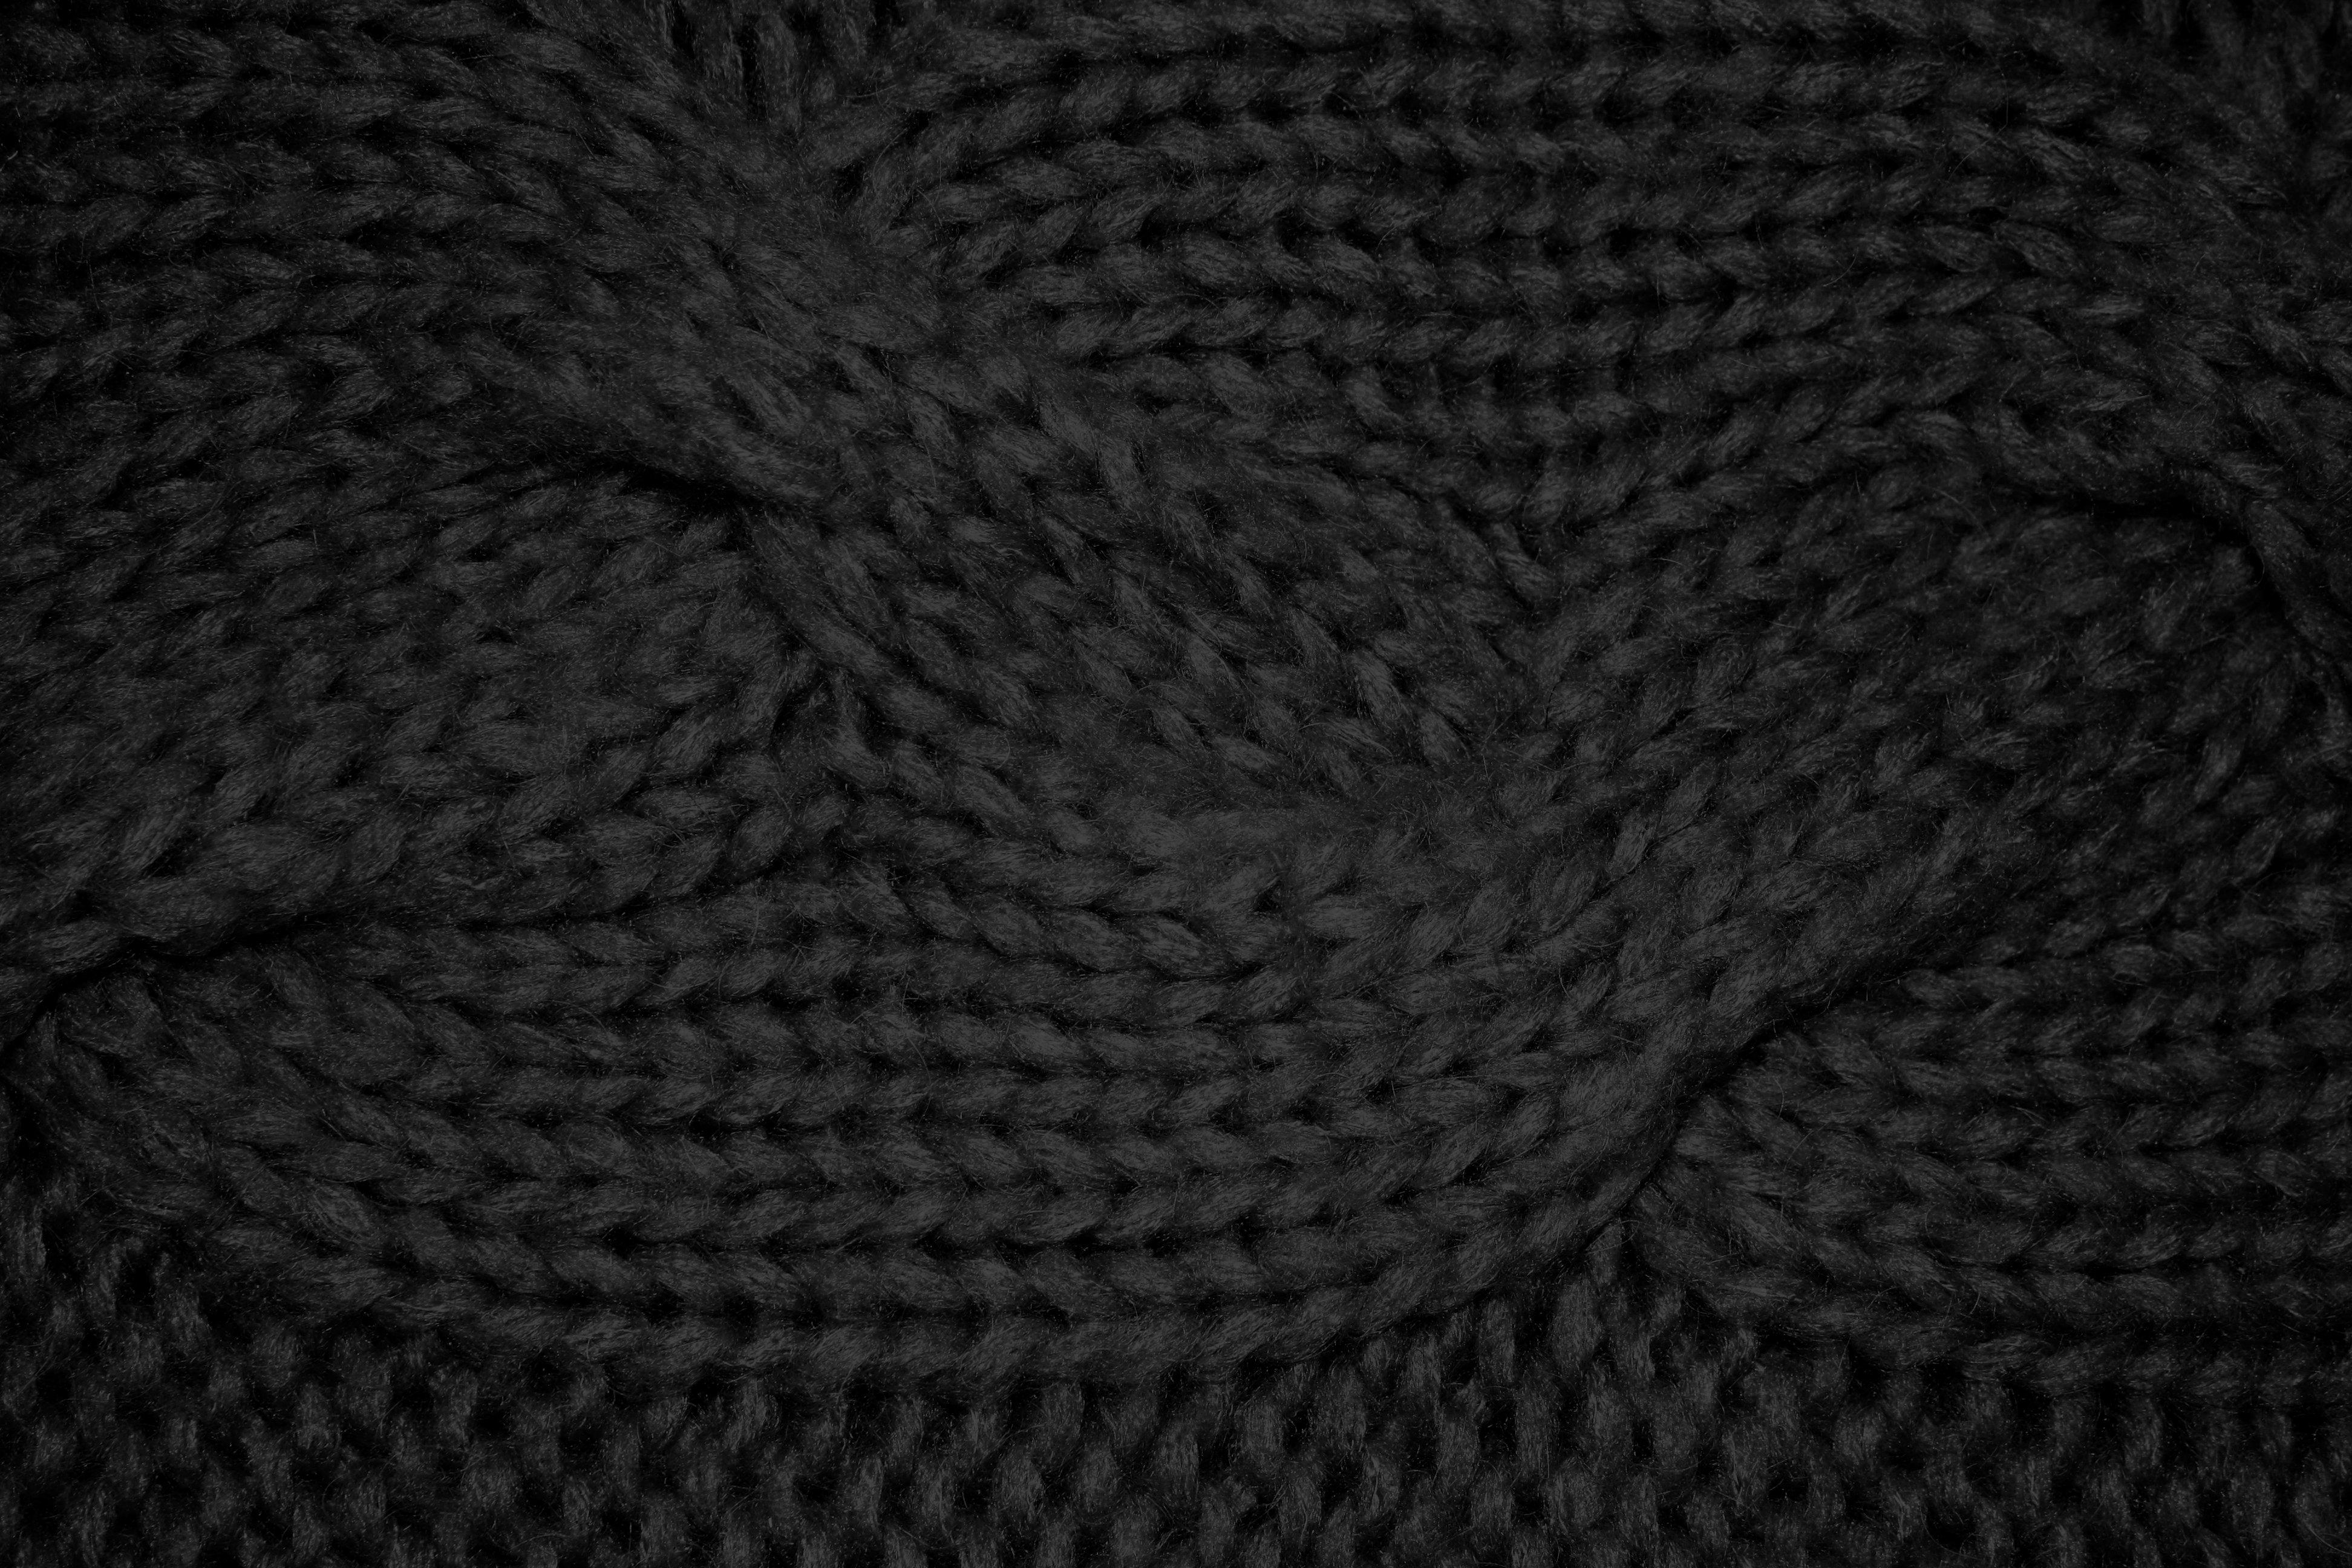 Dark Textures clipart black wool Black Free Black Cable Pattern